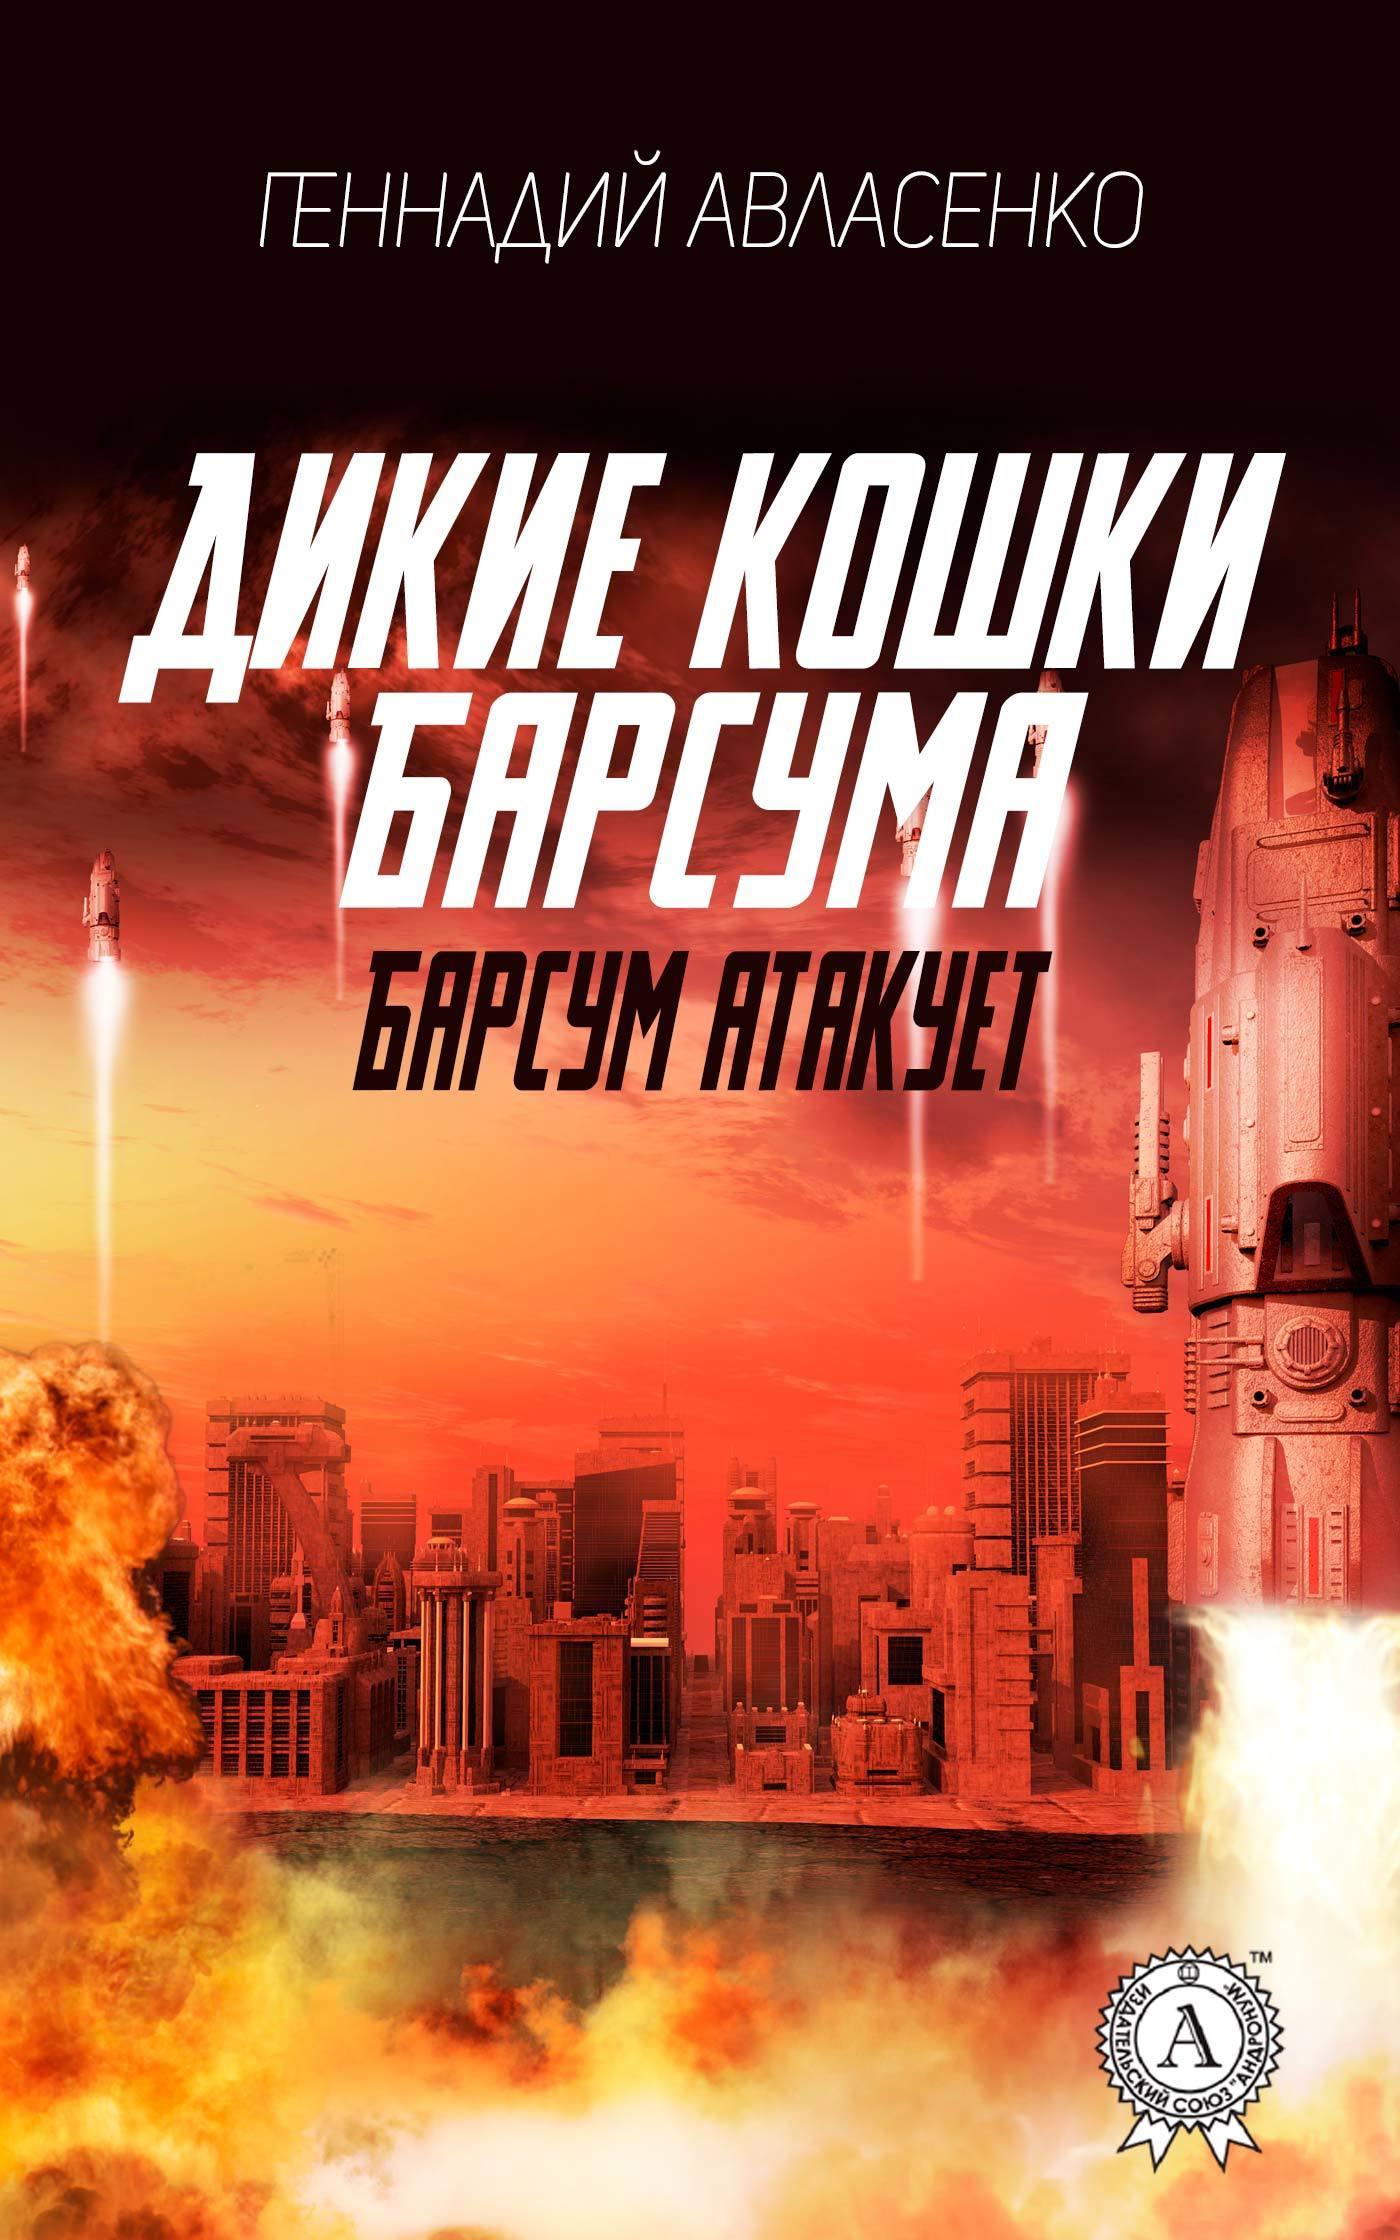 Геннадий Авласенко Барсум атакует ISBN: 9781387436811 мухаммад таки джа фари благоразумная жизнь